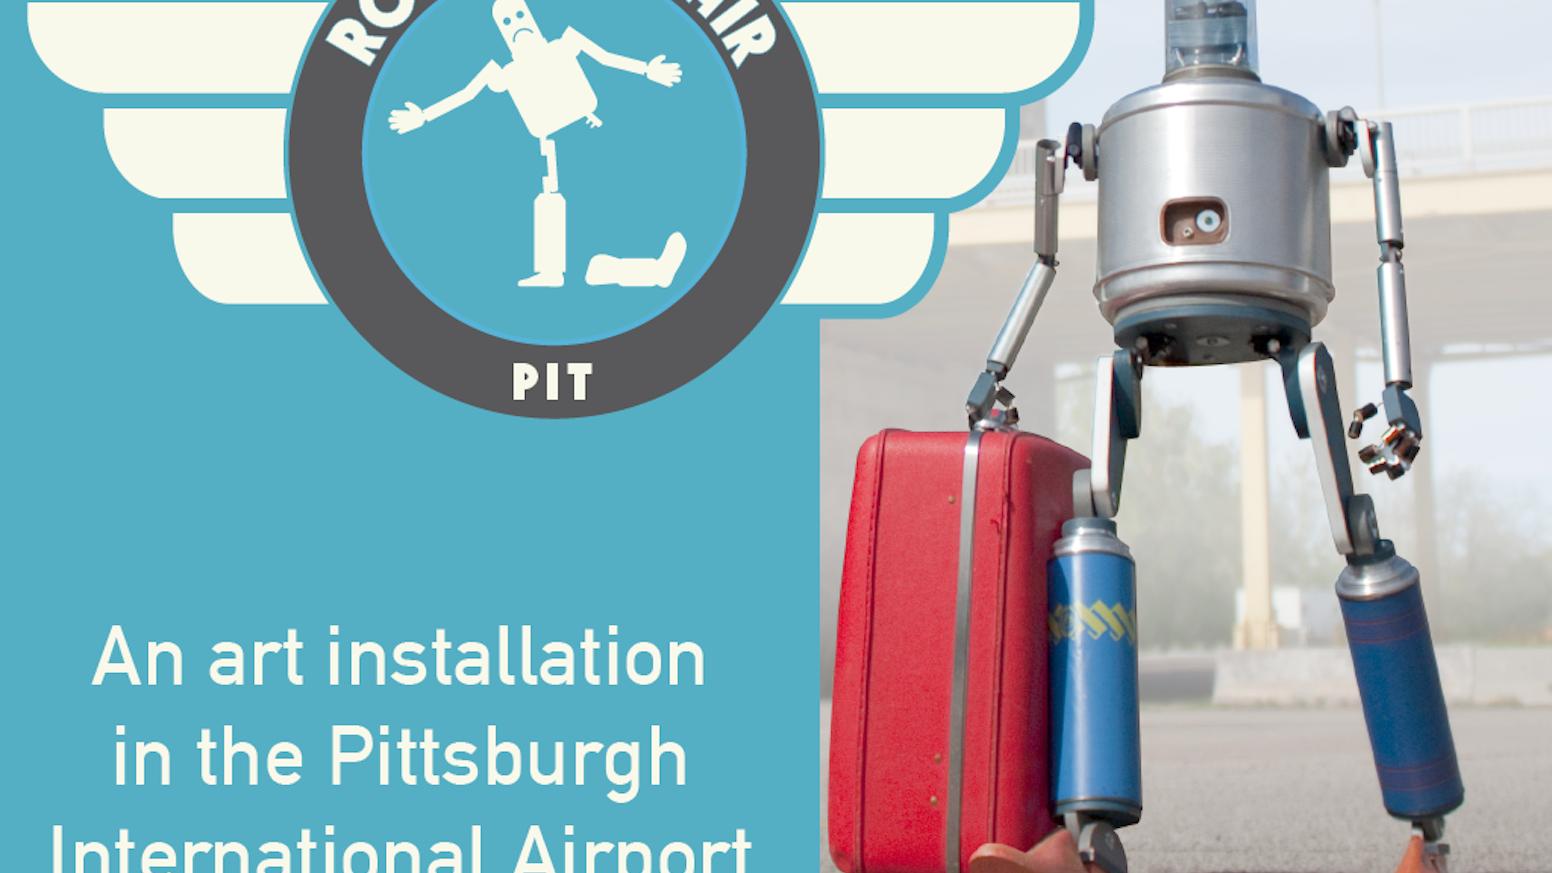 Reimagining and rebuilding the public art installation, Fraley's Robot Repair, in the Pittsburgh International Airport. #PITRobotRepair